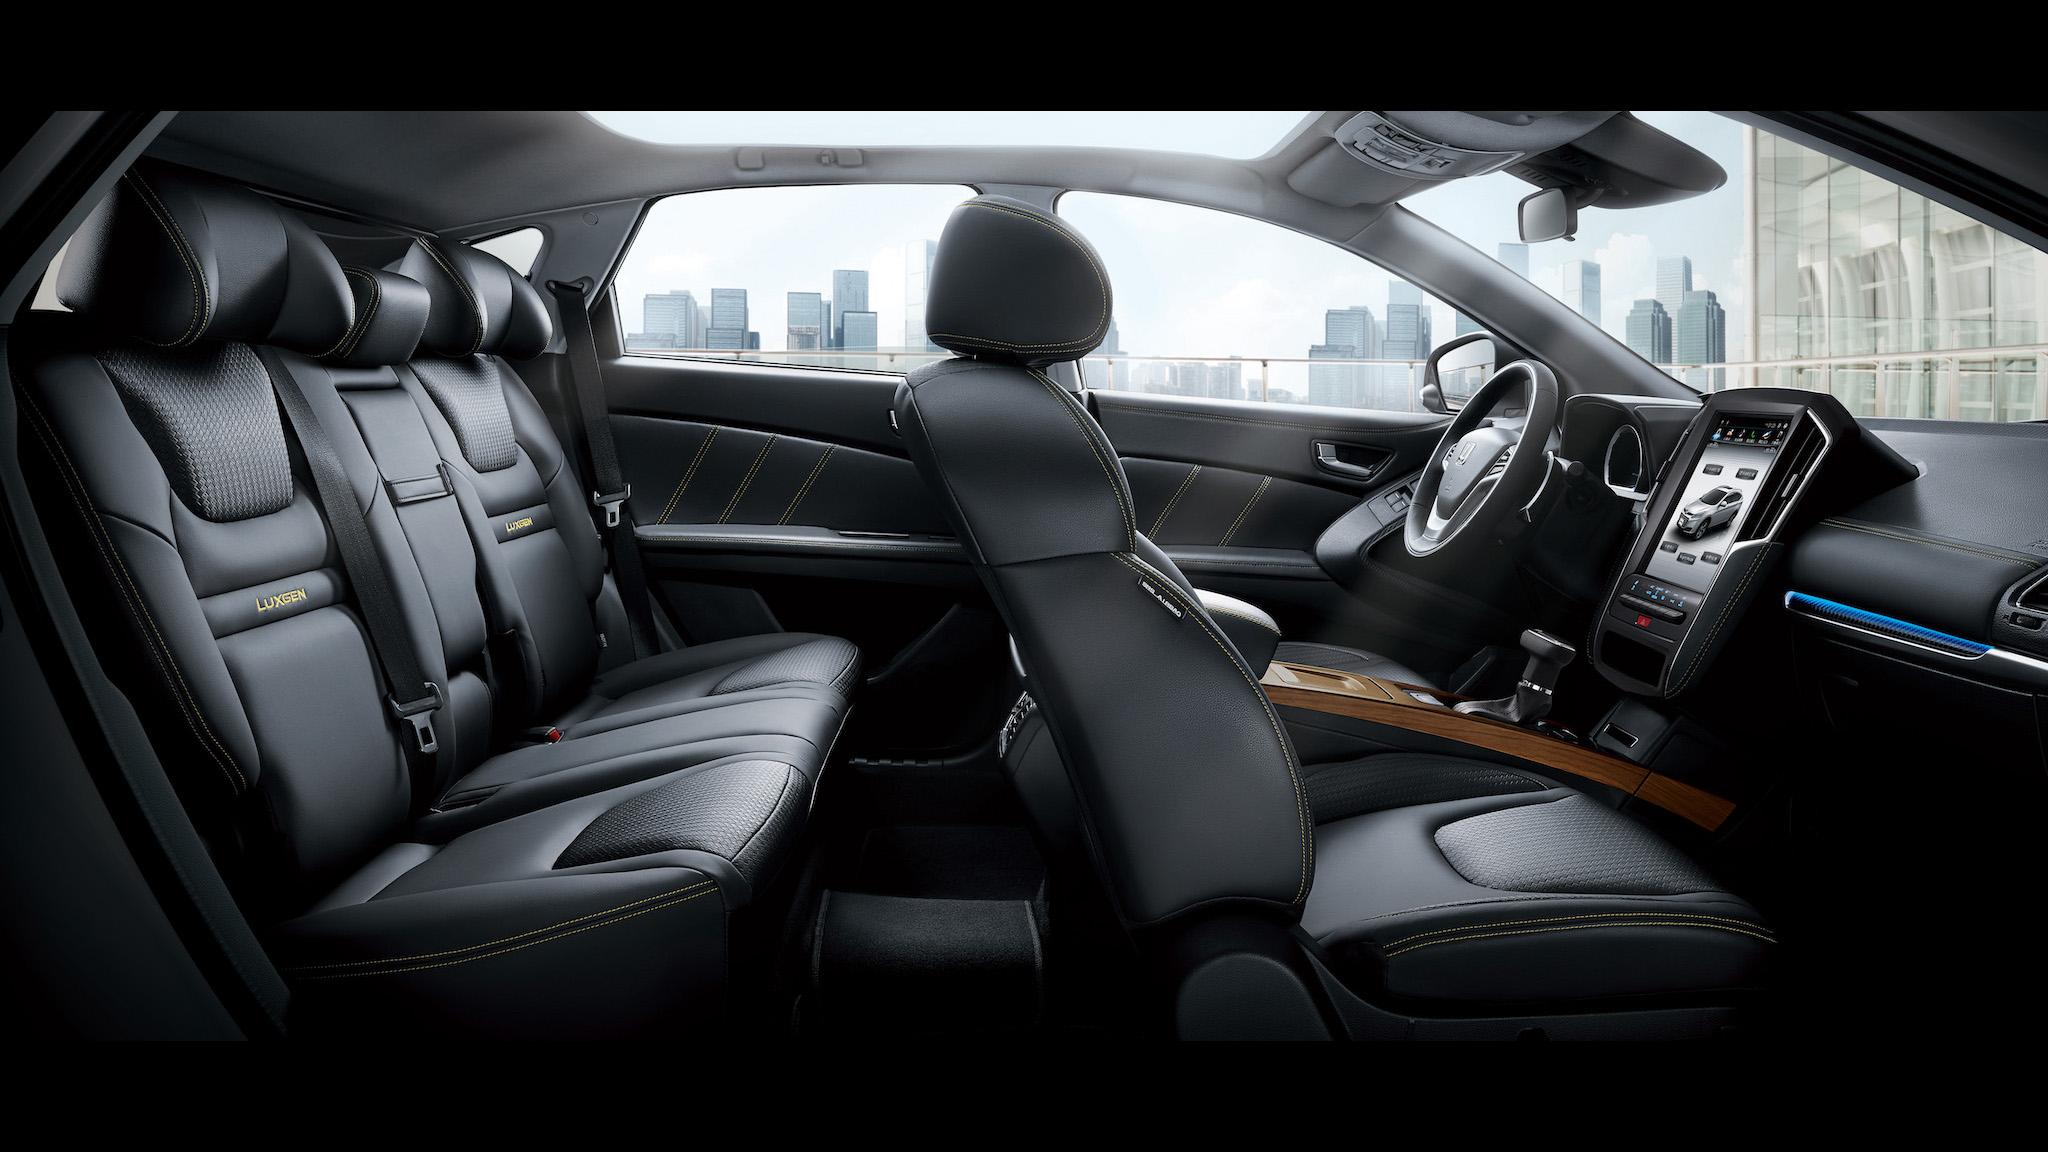 Luxgen U6「GT AR好行版」限量升級大螢幕等科技配備 售價 80.8 萬元